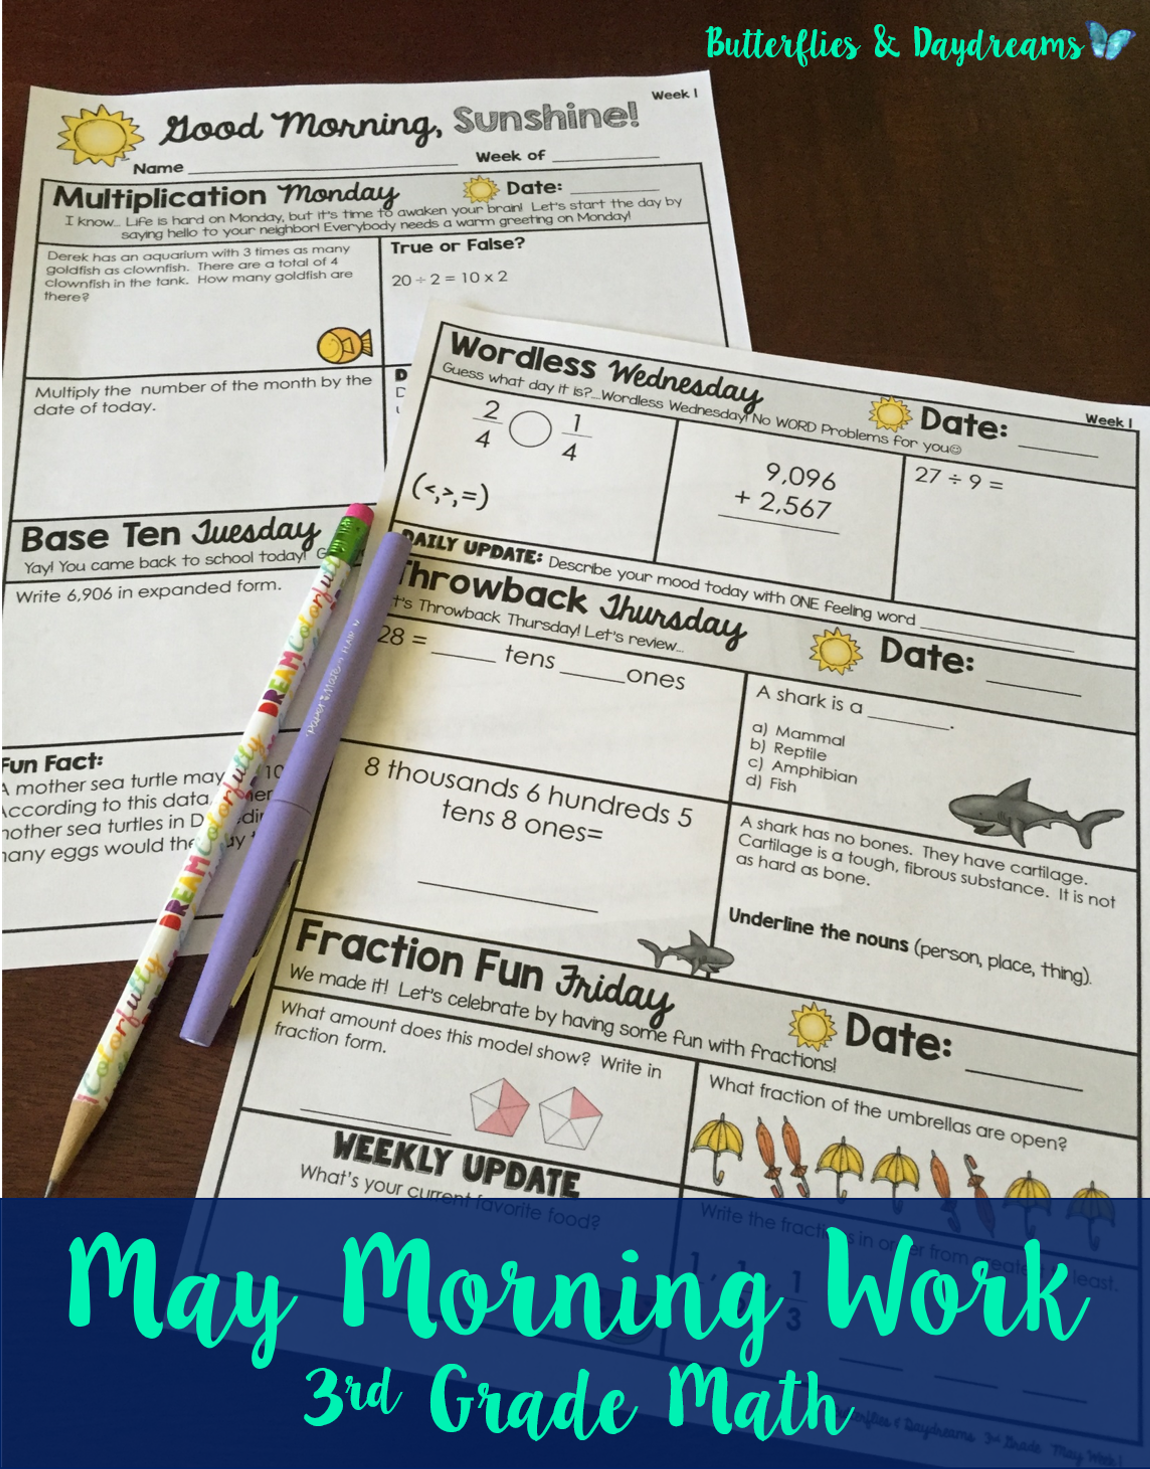 Morning Work 3rd Grade May